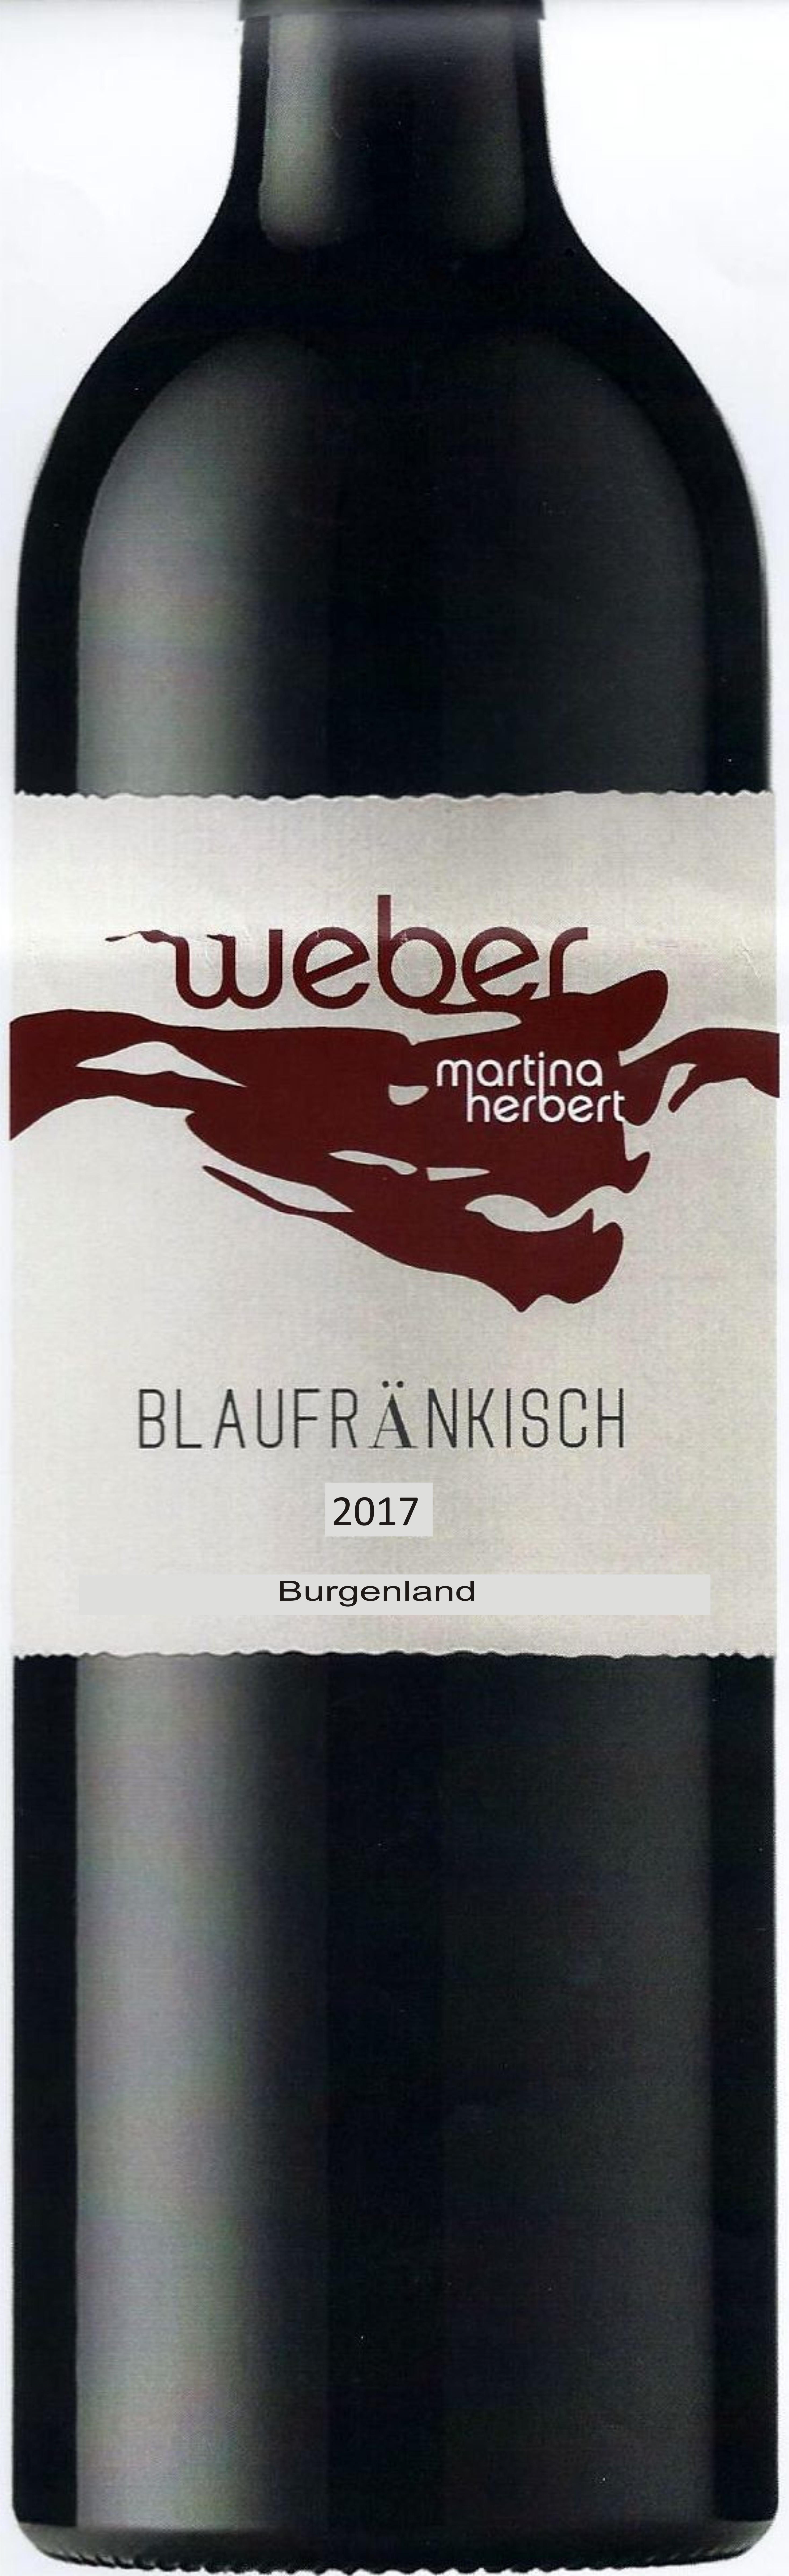 Blauburger 2018